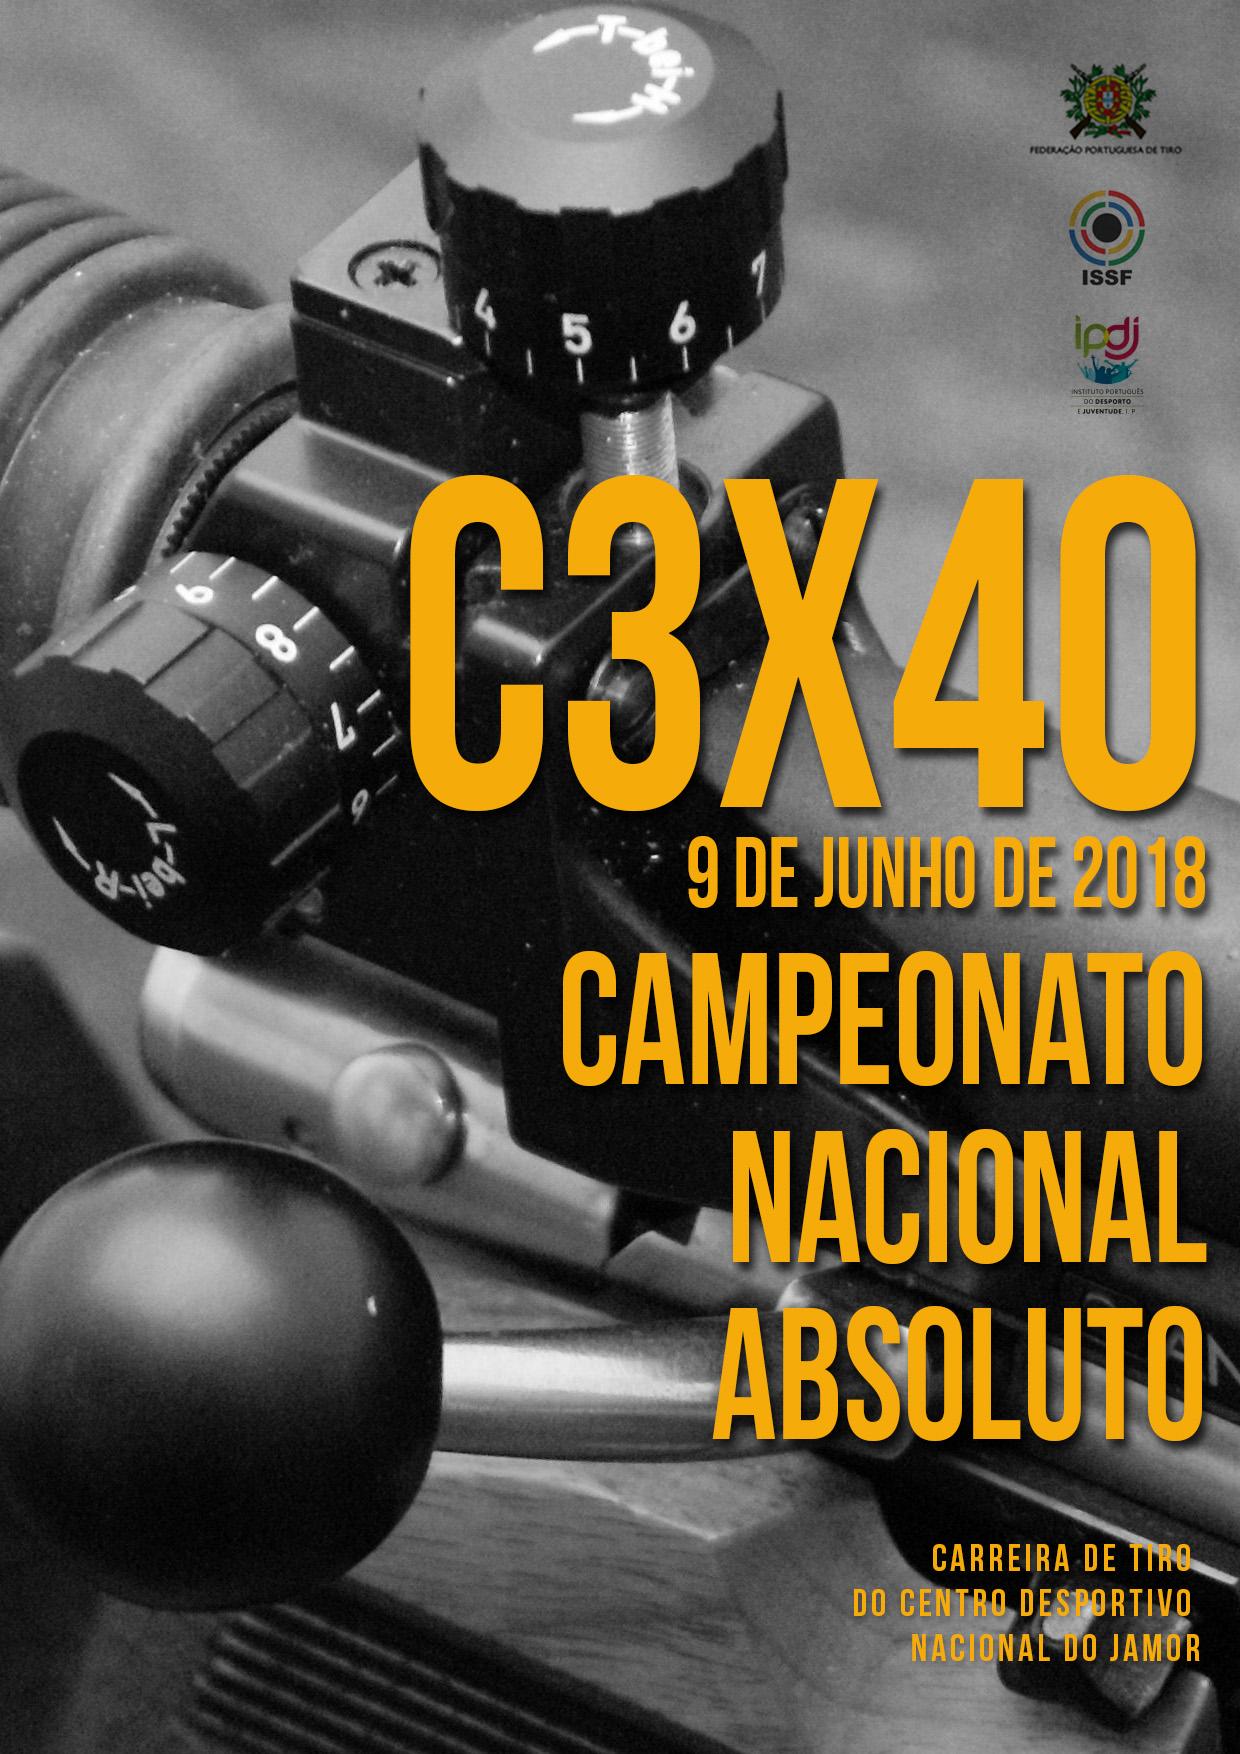 Campeonato Nacional C3x40 2018